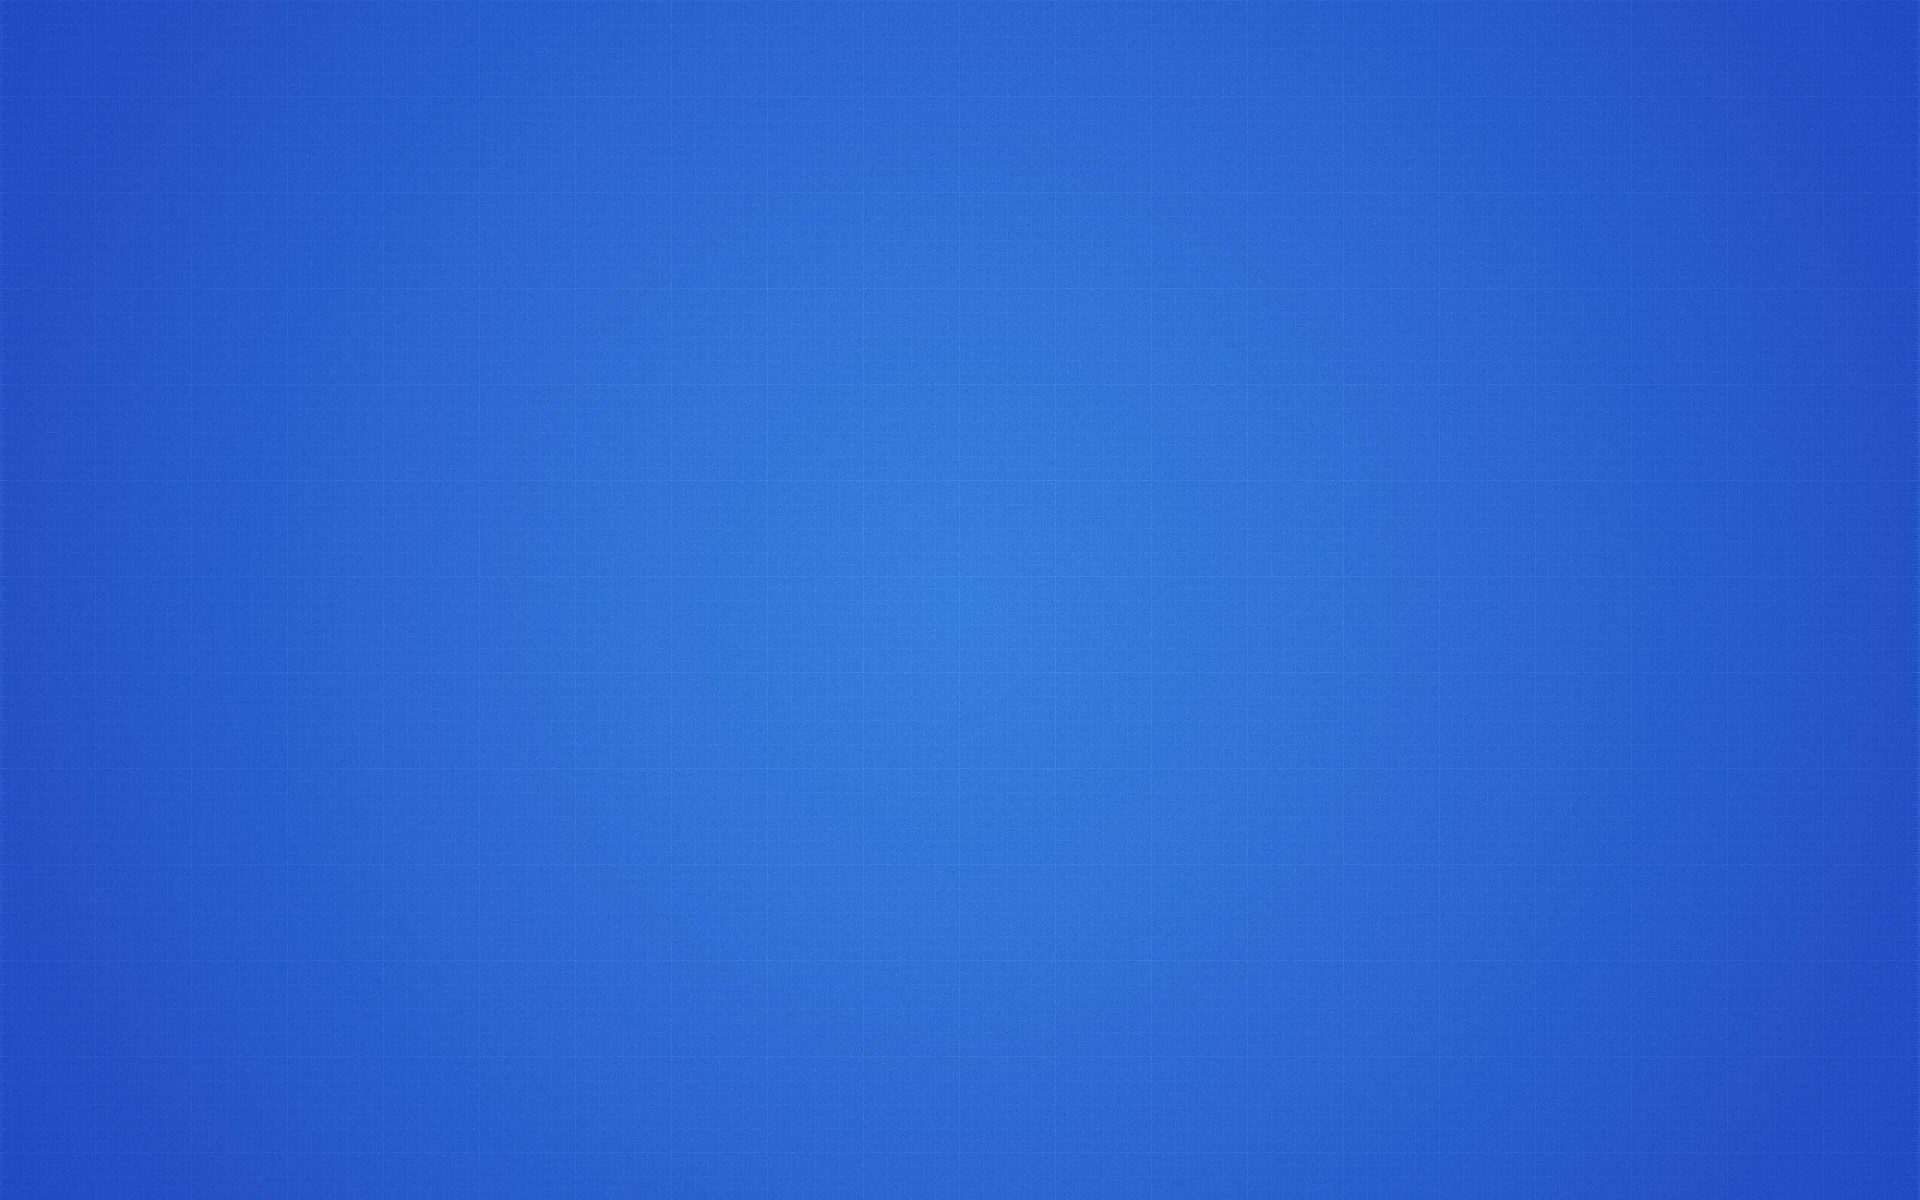 light-blue-plain-beautiful-wallpapers